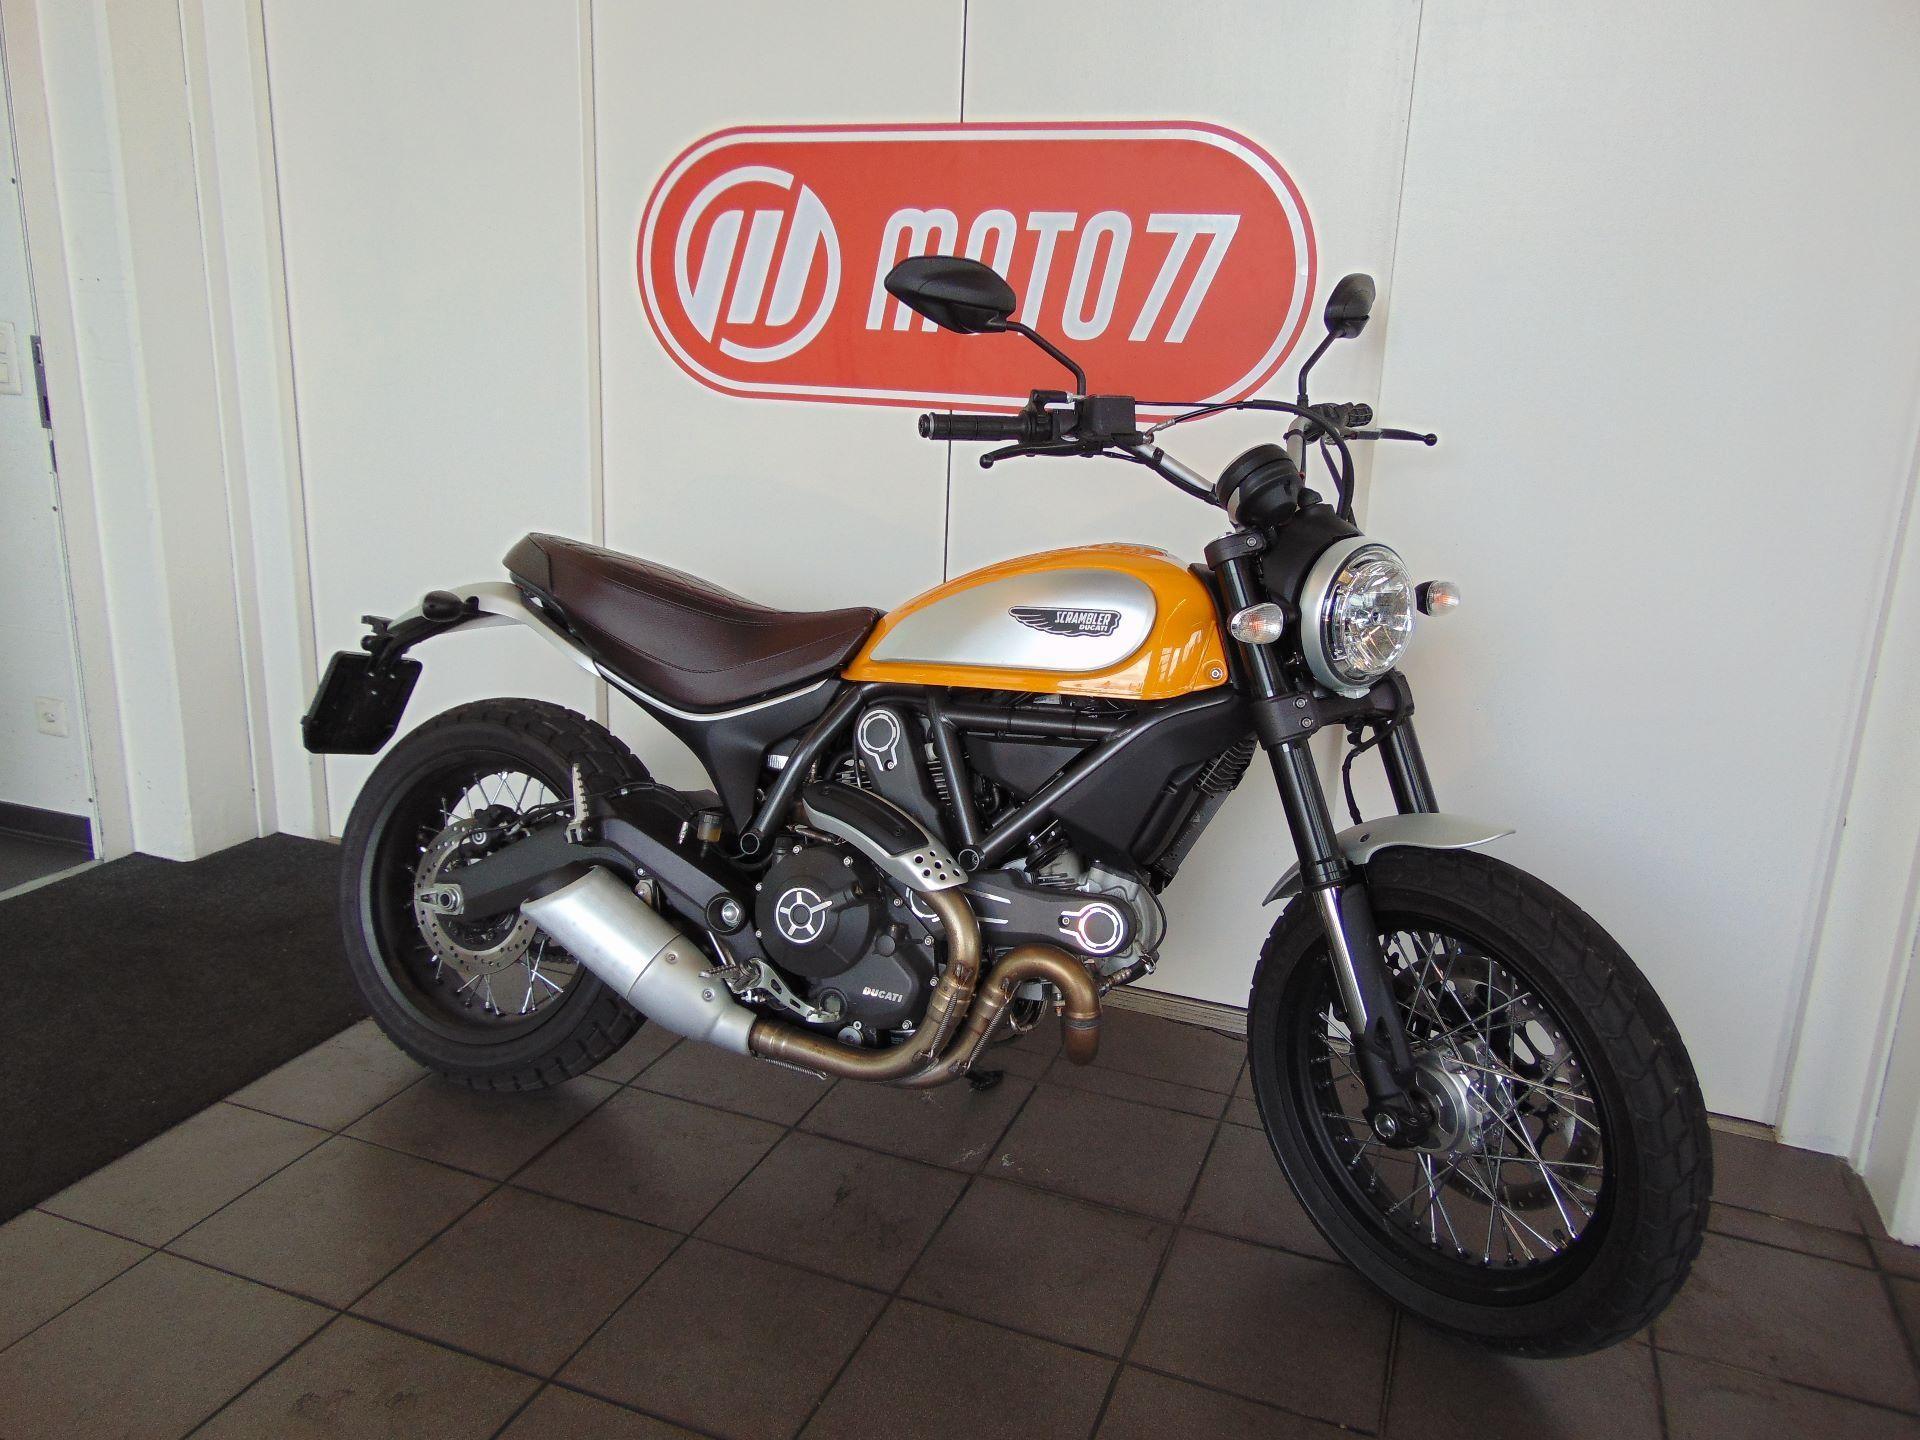 motorrad vorf hrmodell kaufen ducati 800 scrambler classic moto77 ag frauenfeld. Black Bedroom Furniture Sets. Home Design Ideas